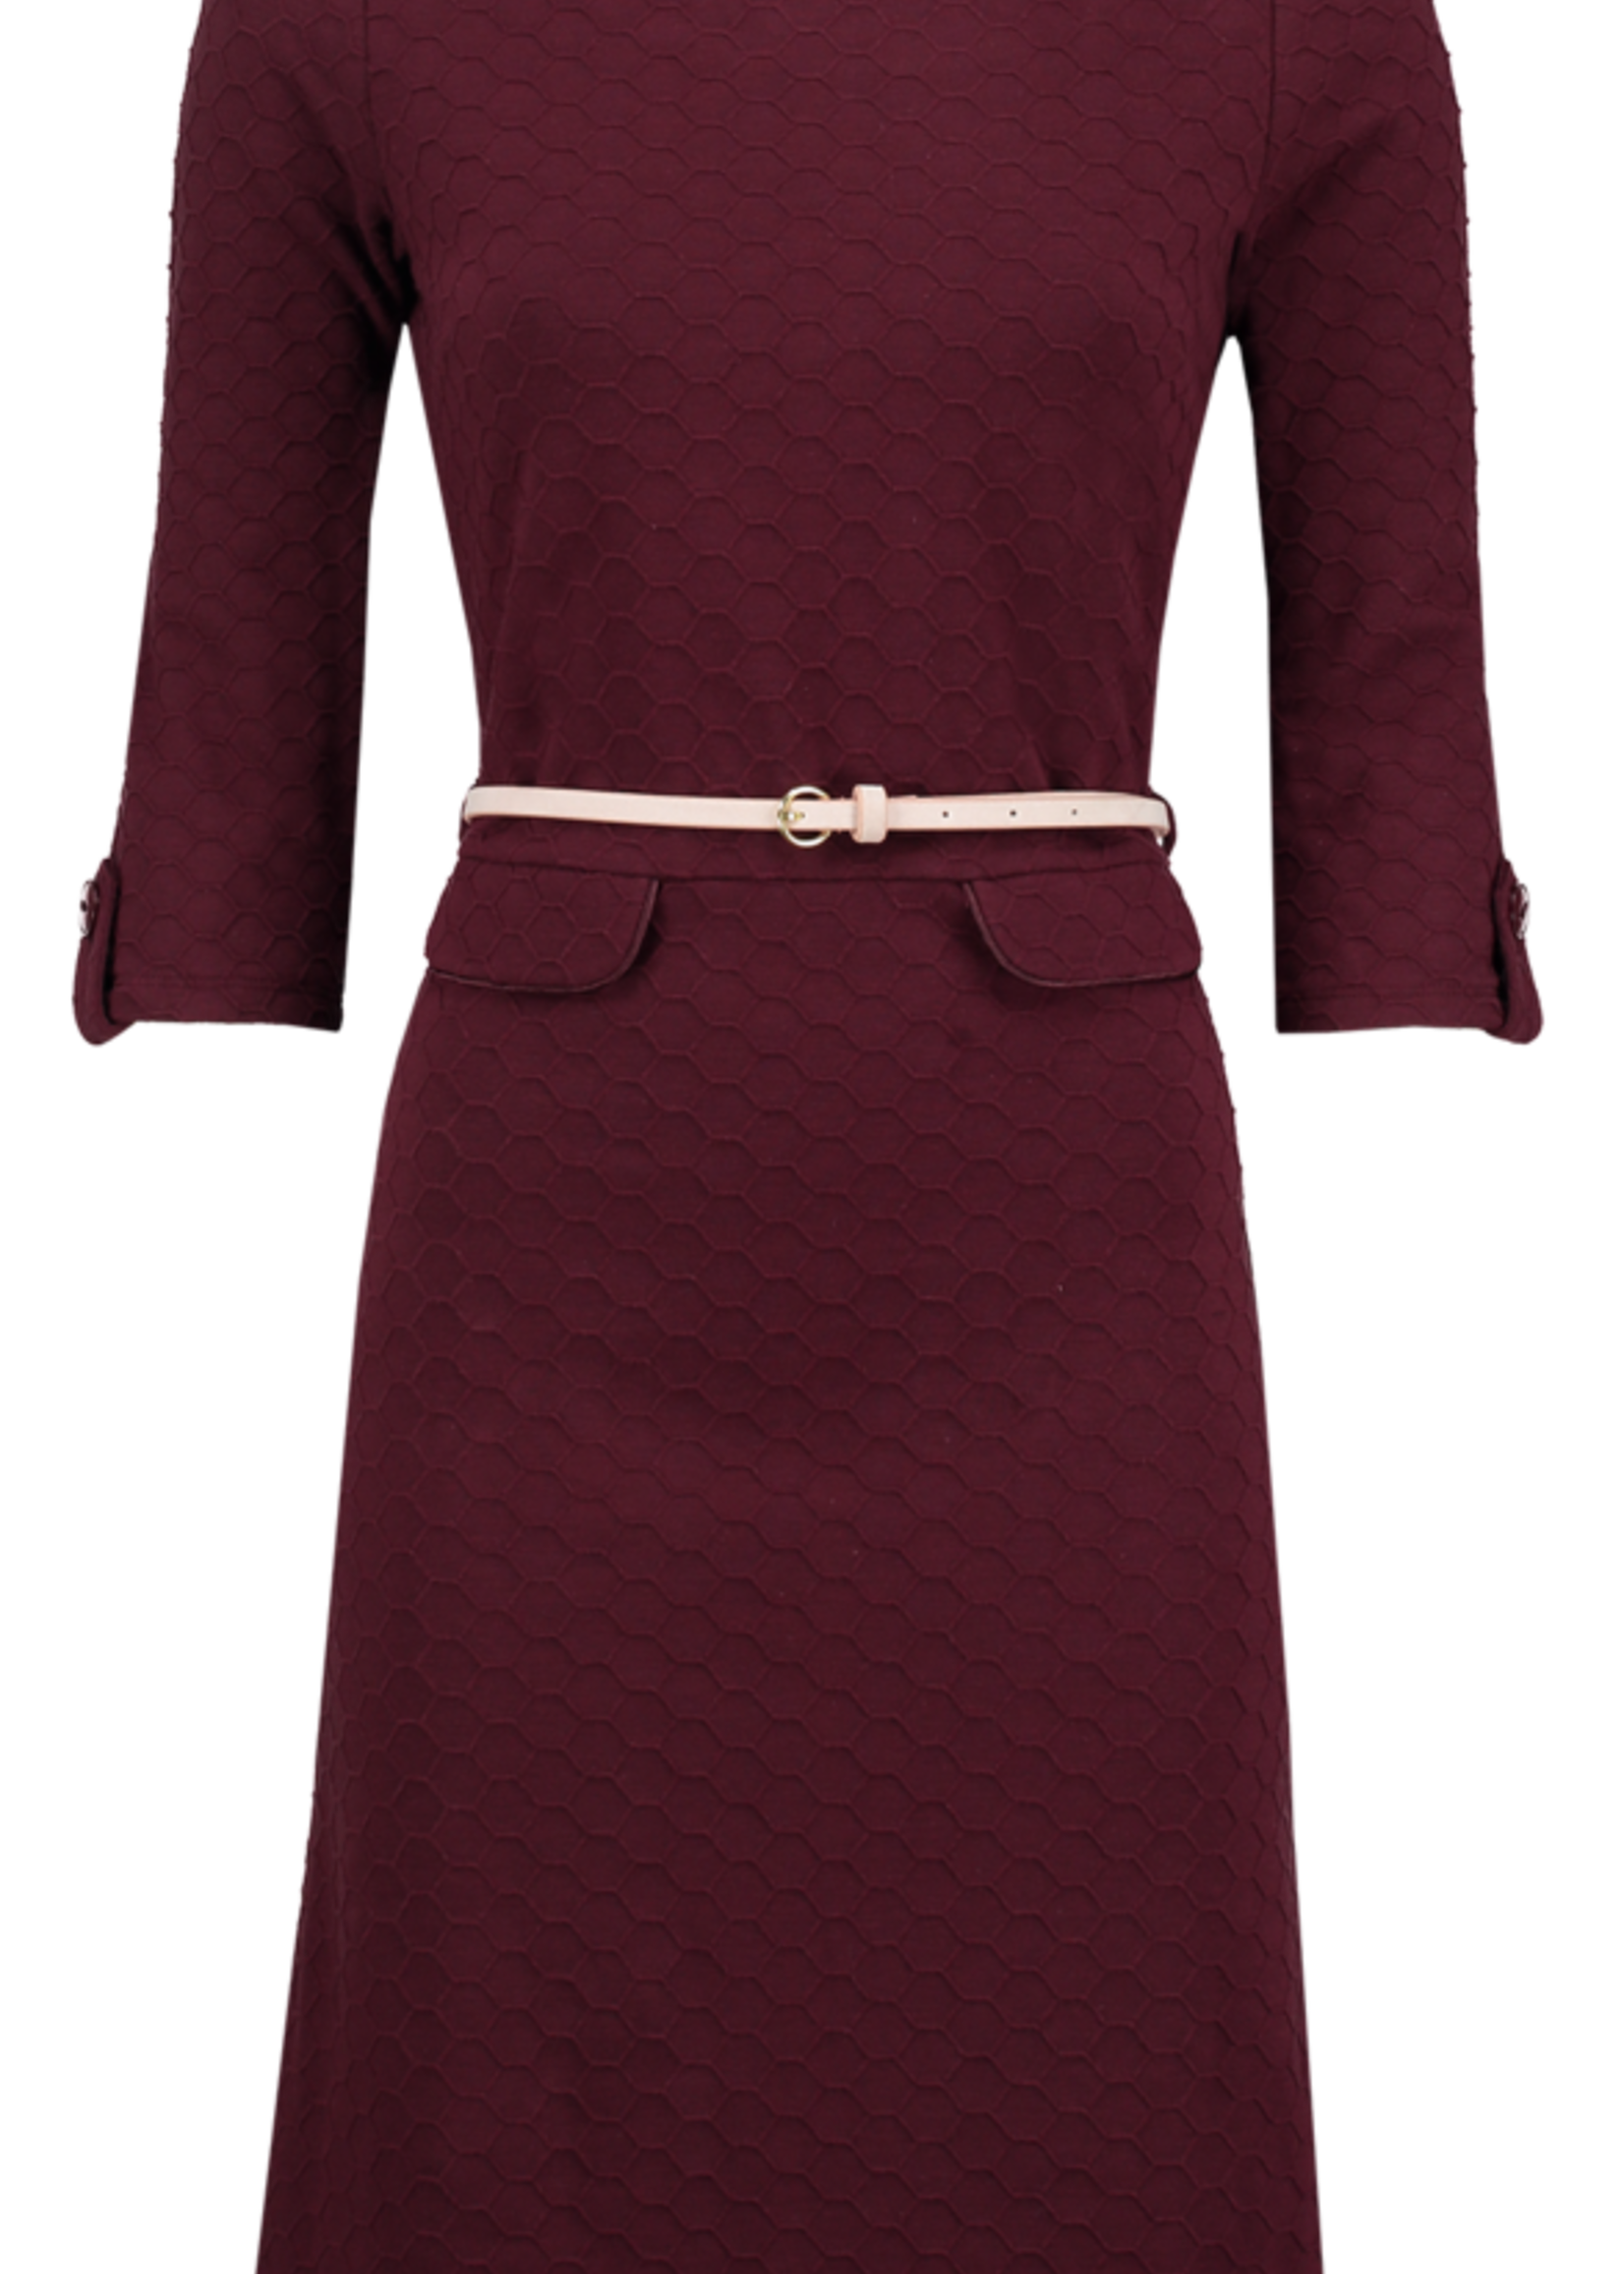 LEPEP dress Felicity port